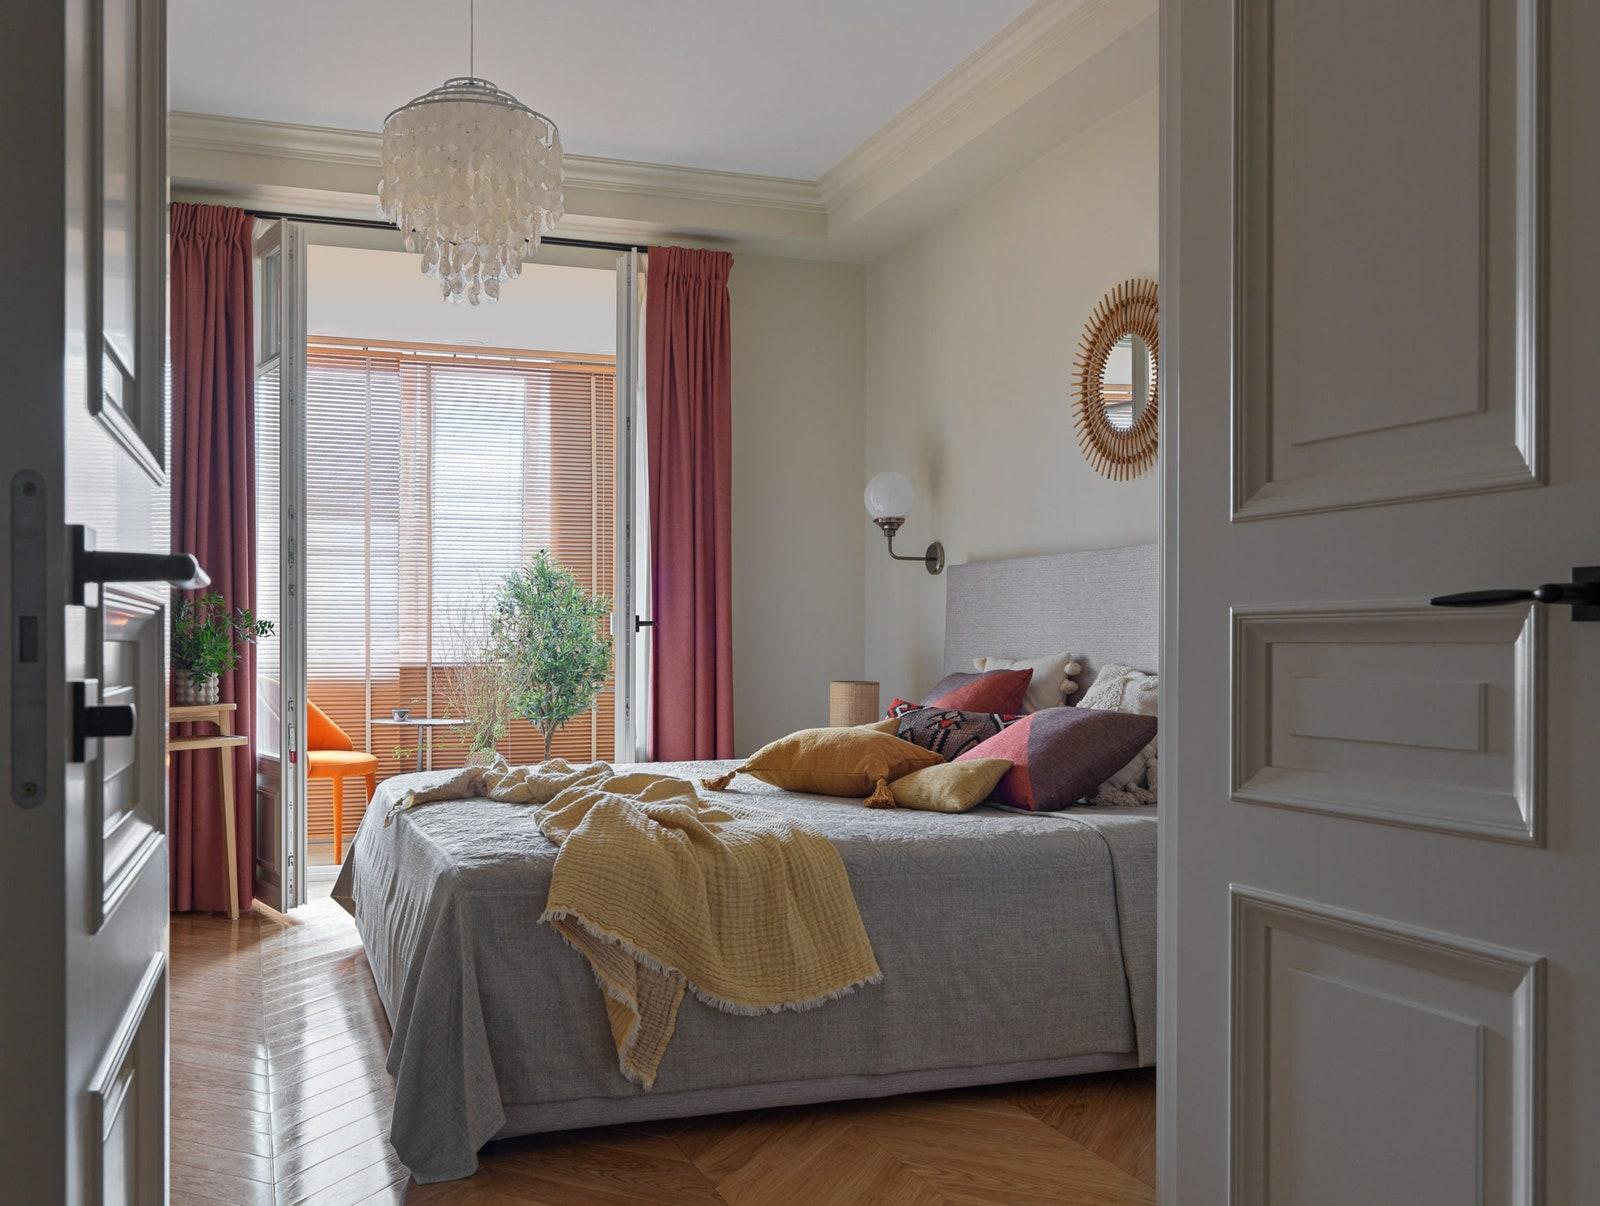 145 . .  Dantone Home      La Redoute   Maisons du Monde      Loft Designe  Mullan   Verpan  Zara Home Nomad hic     .